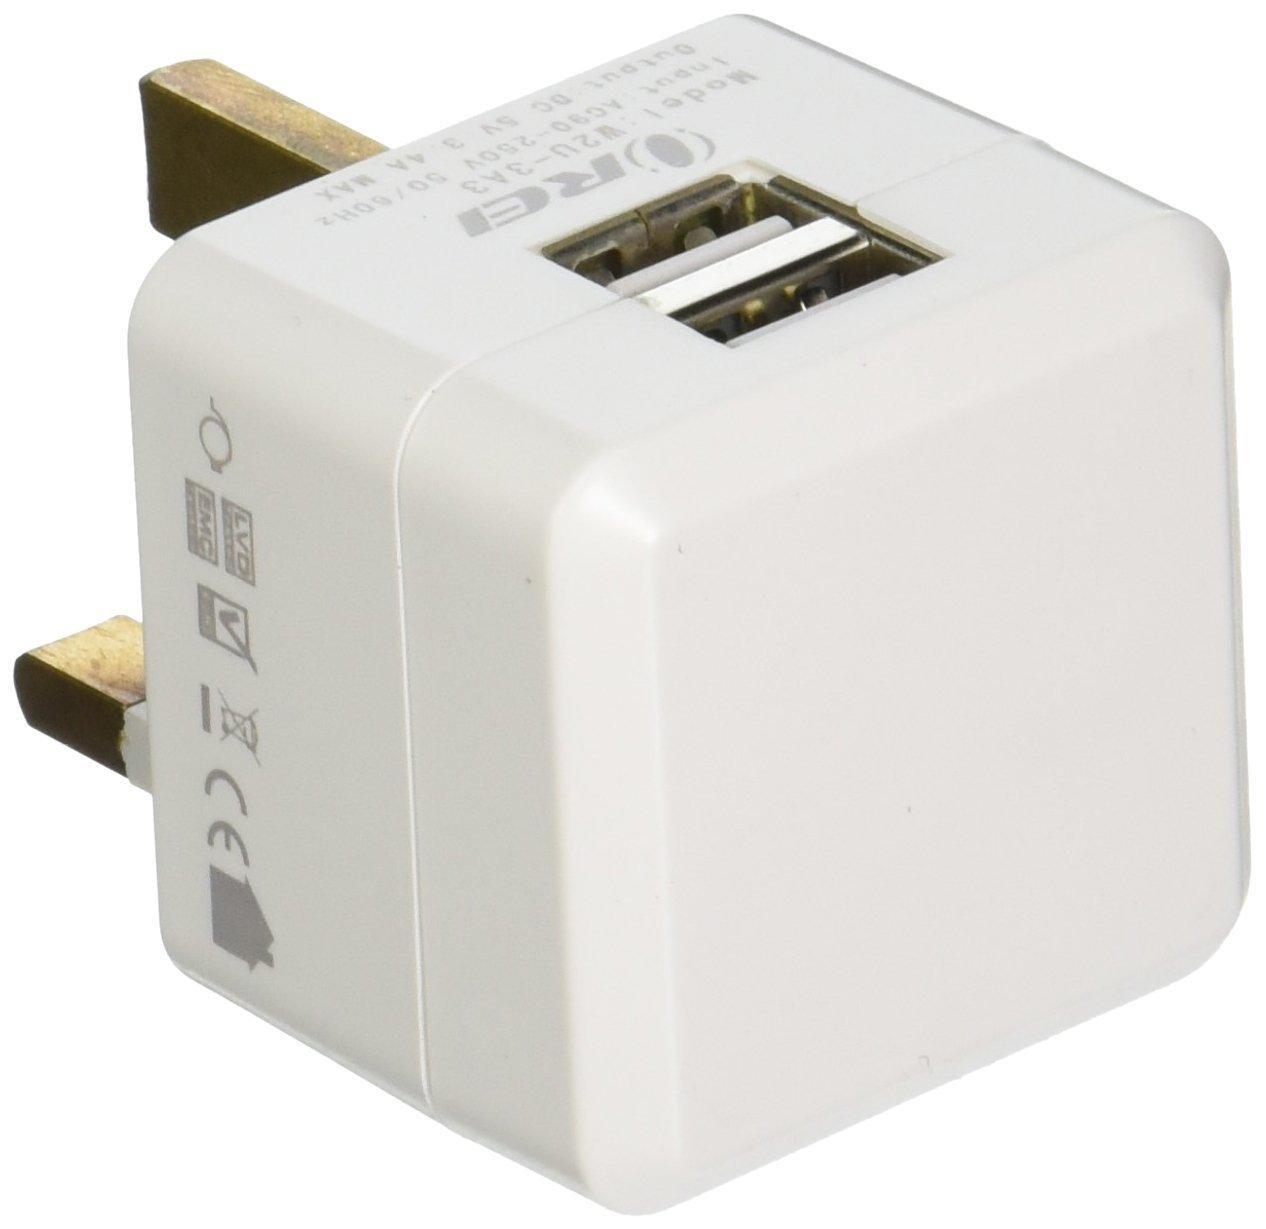 OREI 3.4A 2 USB Plug Adapter Type G for UK, Hong Kong, Singapore - iPhone/iPad, Galaxy & More